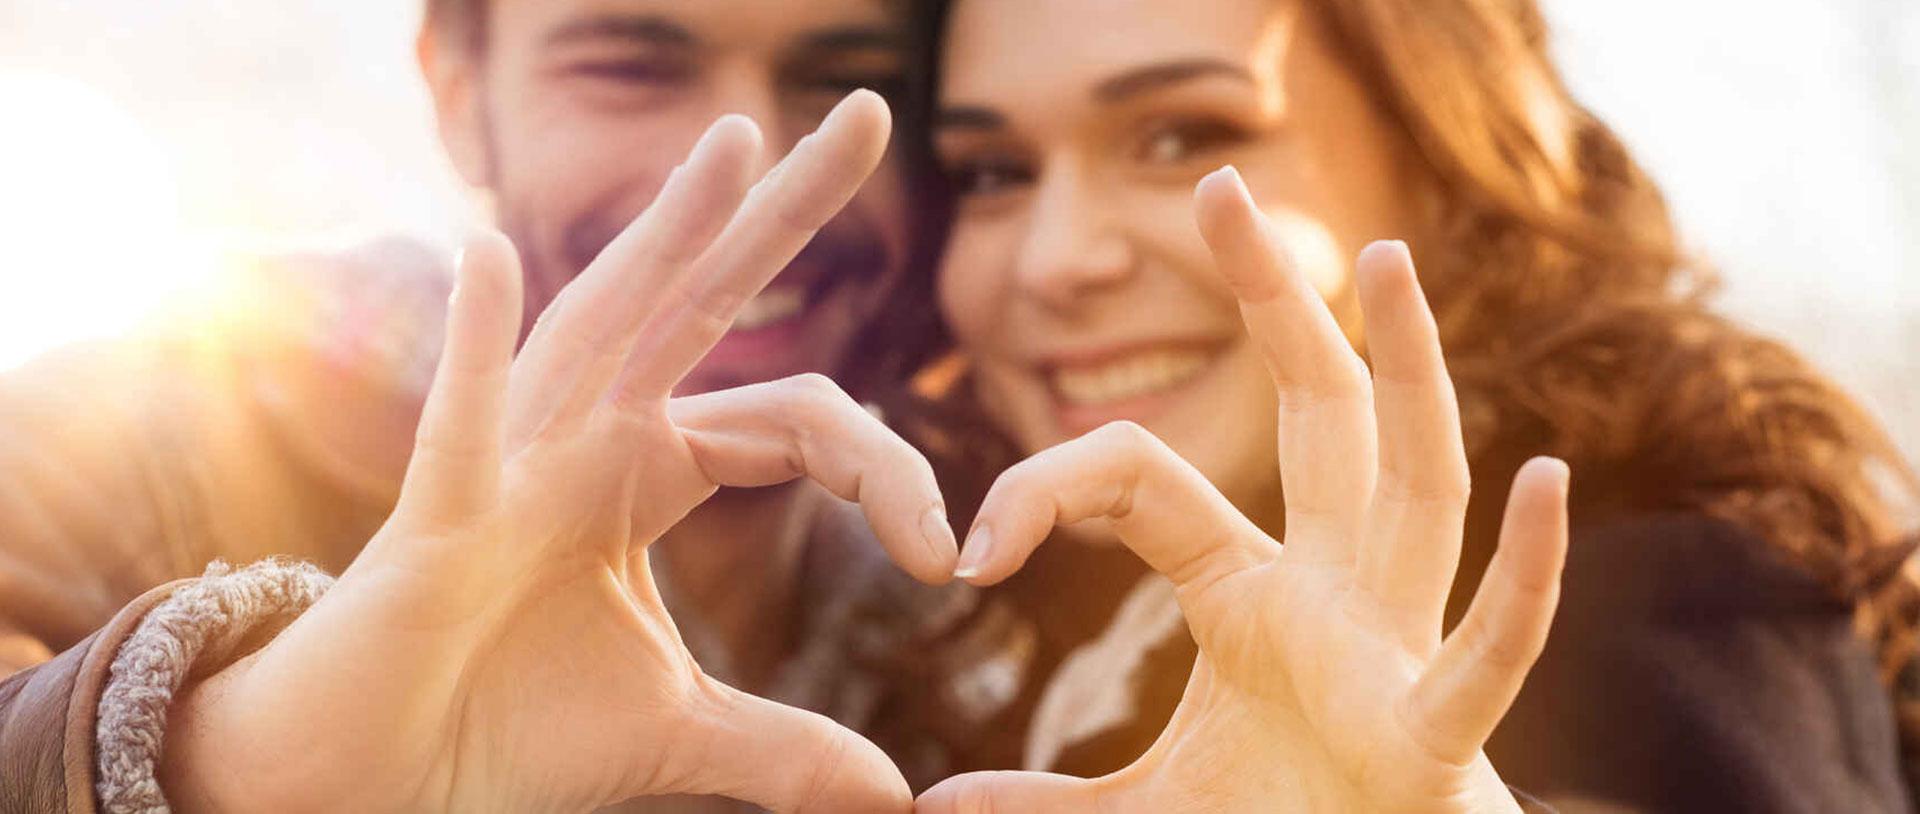 benefits common-law couples